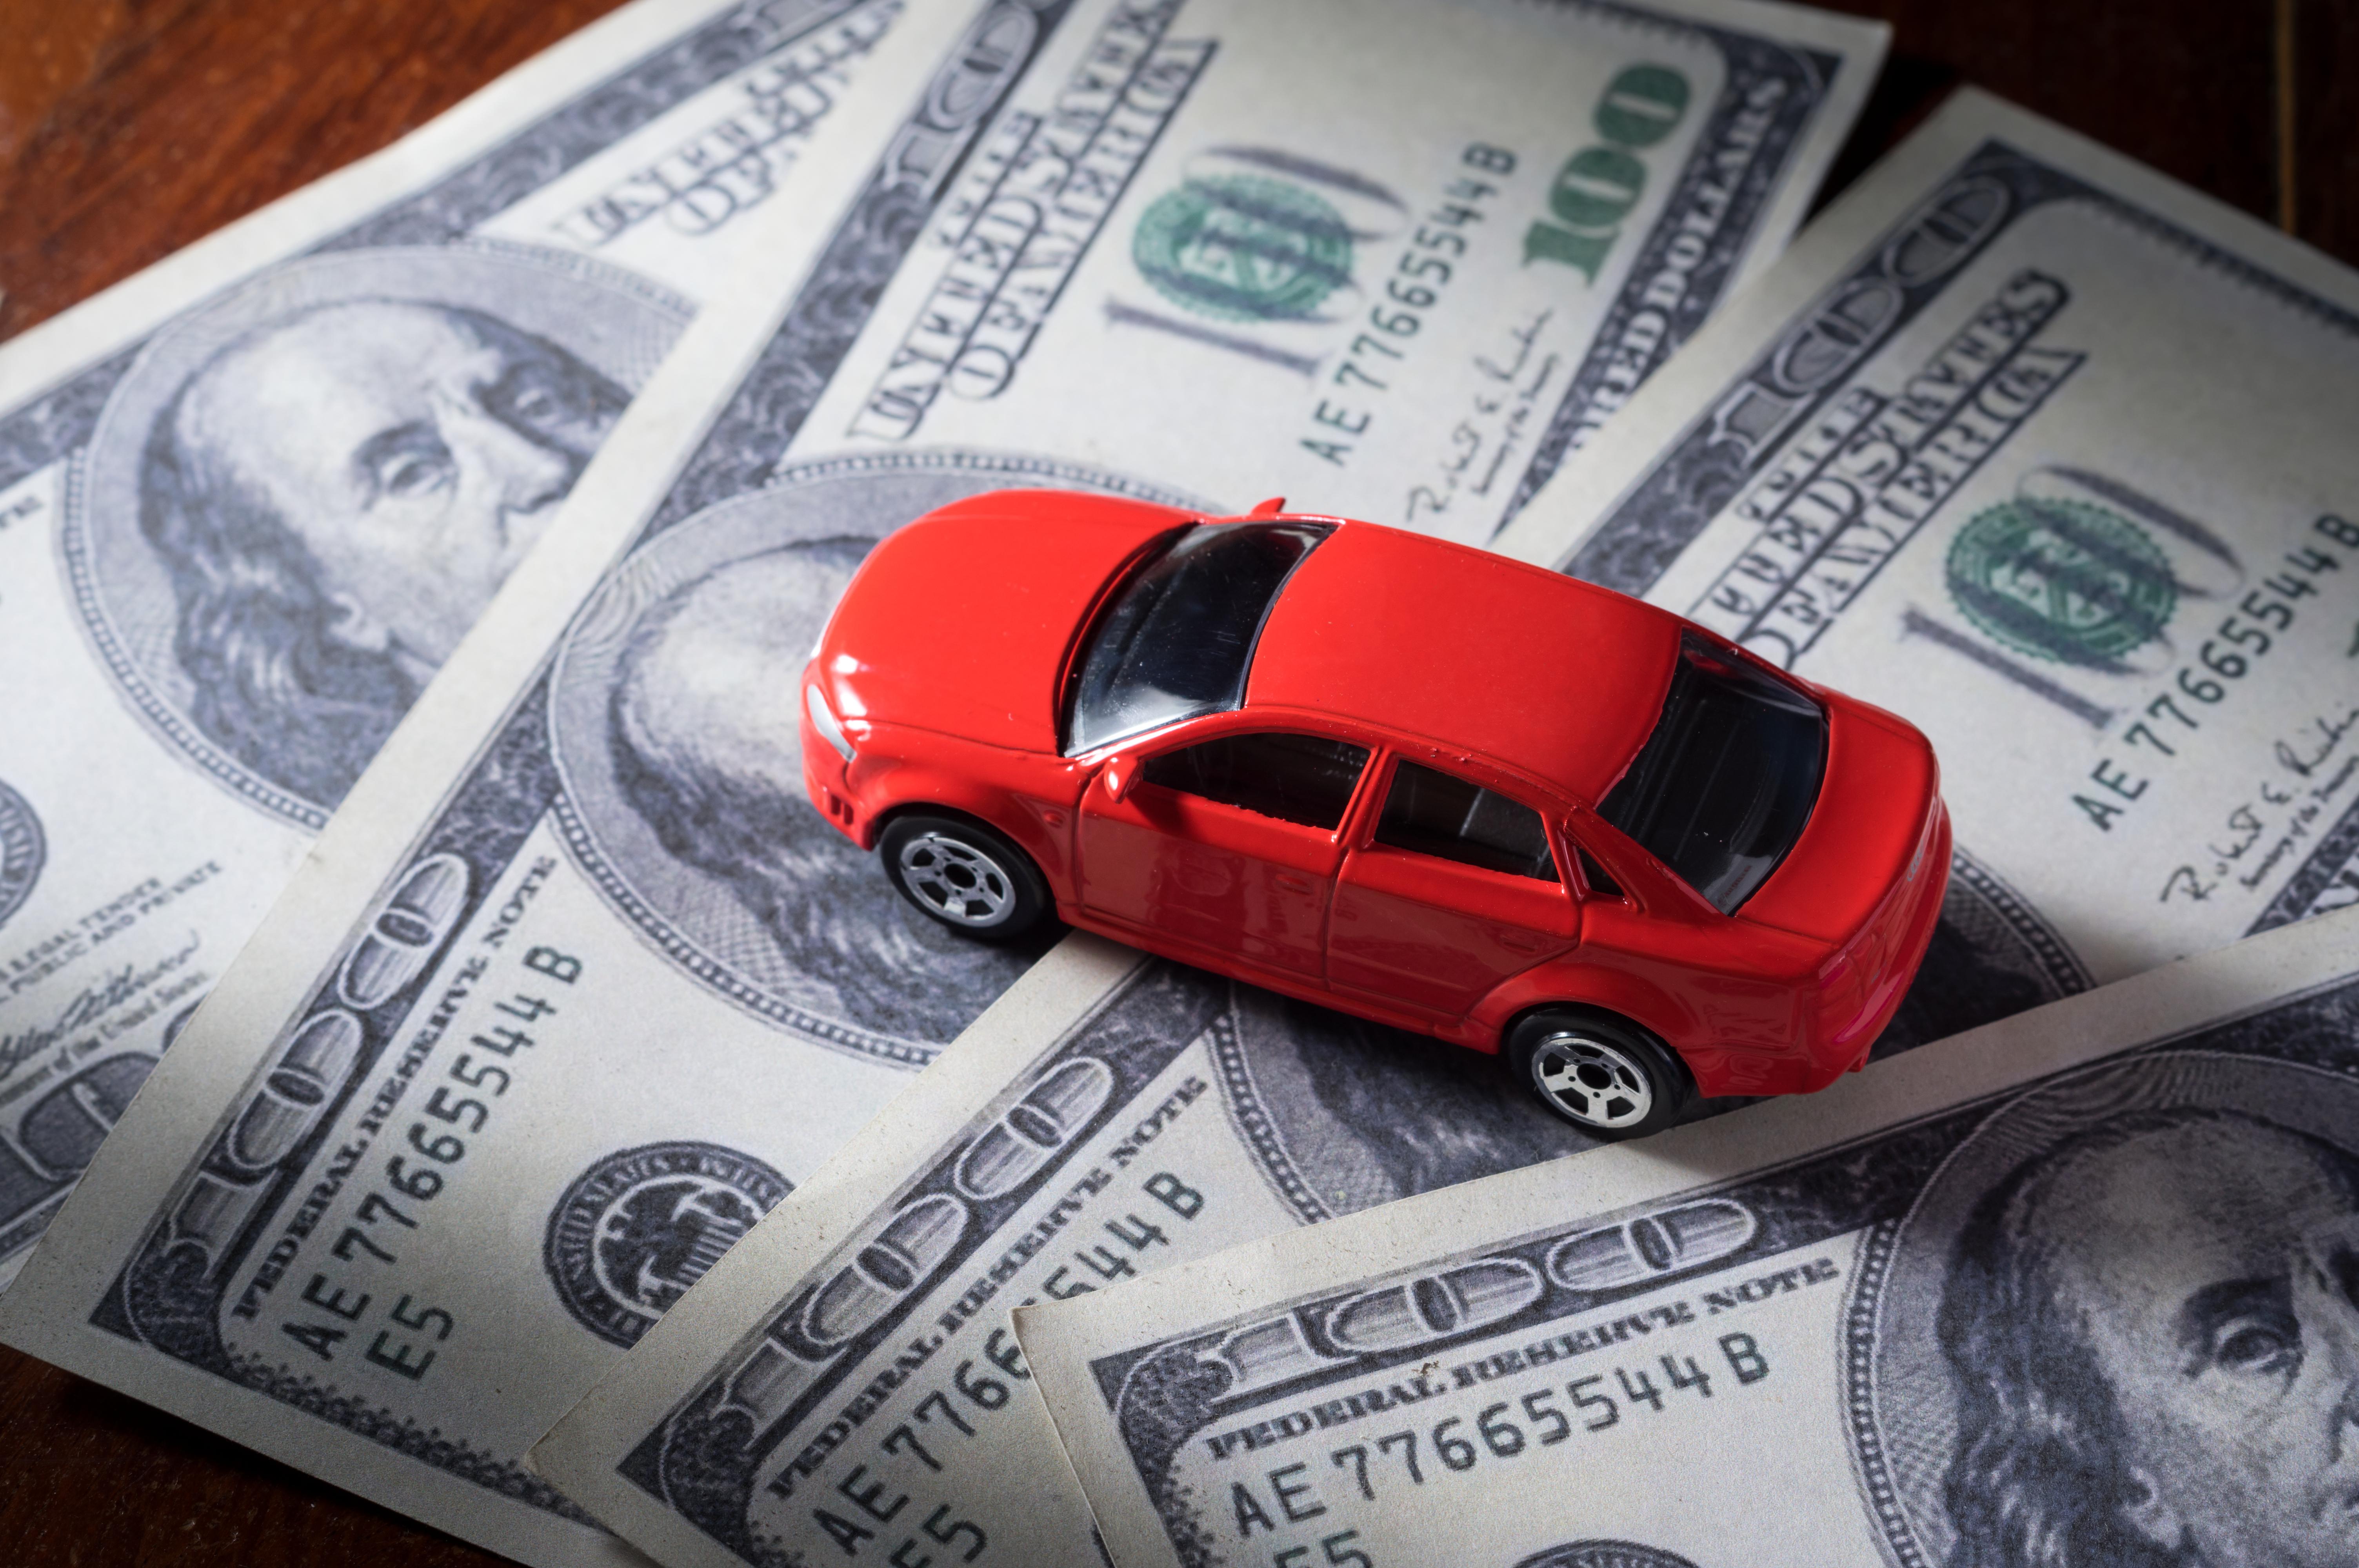 Sell my car Sell a Car Sell a Used Car Car Tradein at